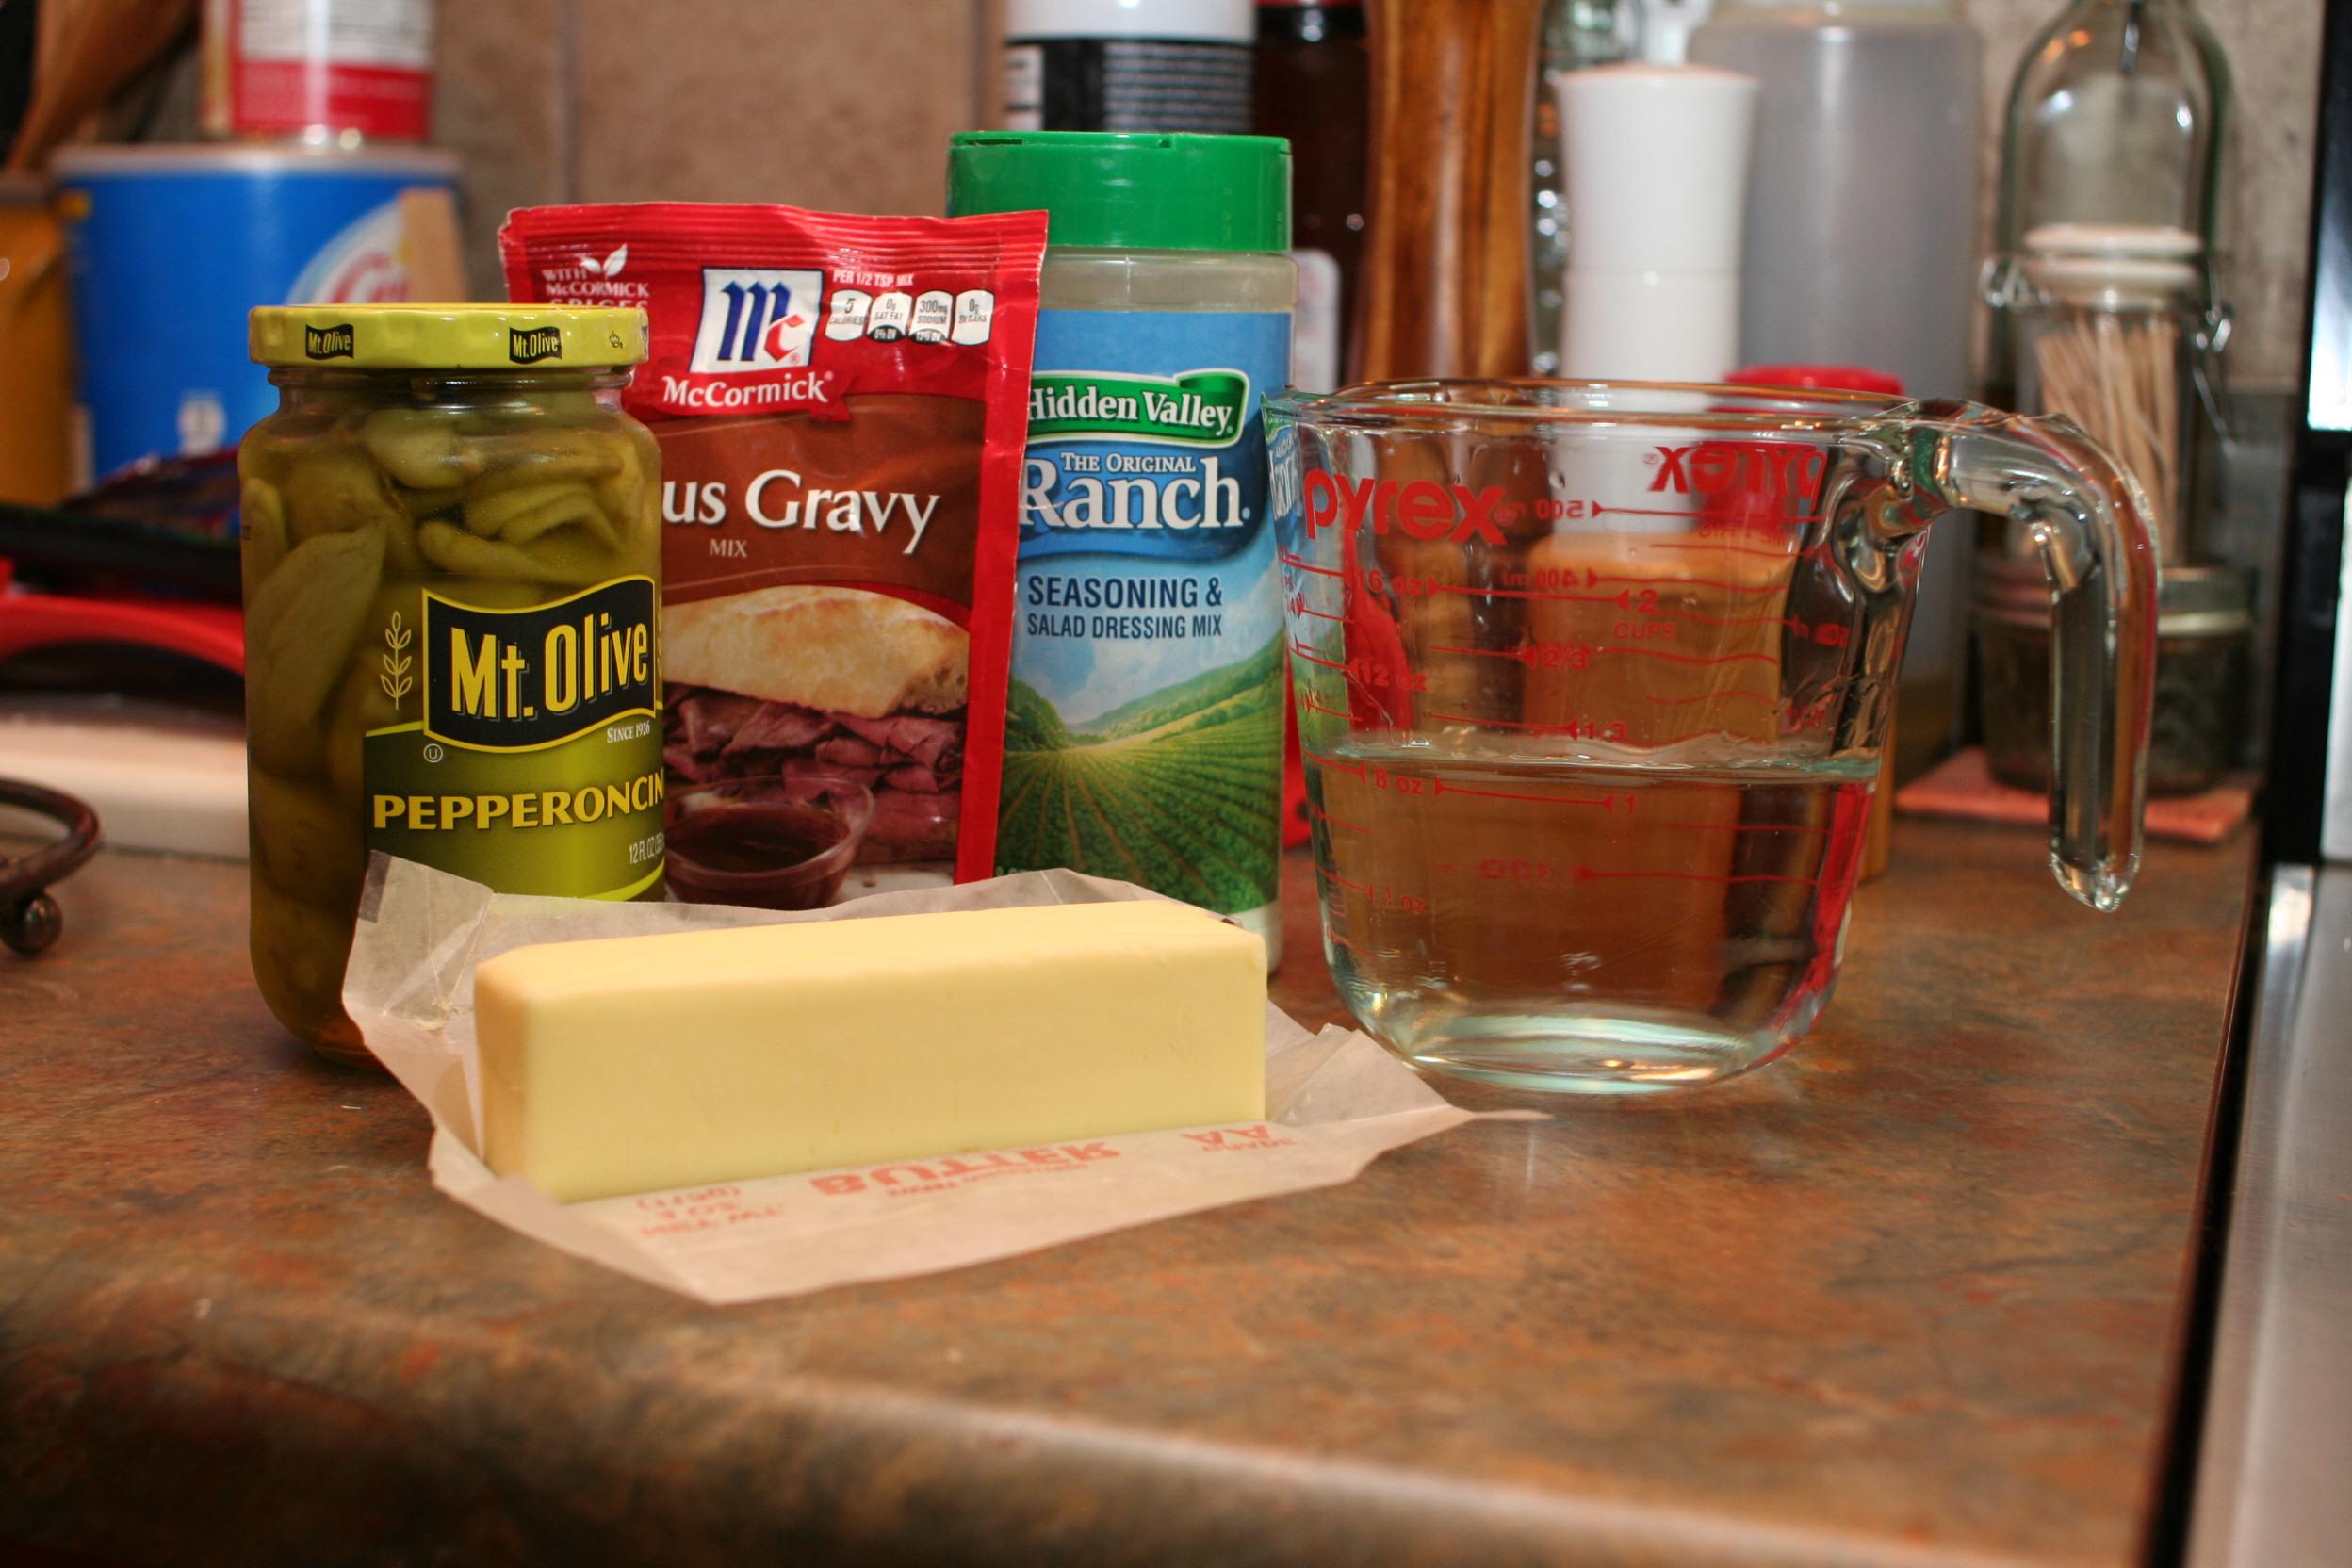 Mississippi Roast Ingredients